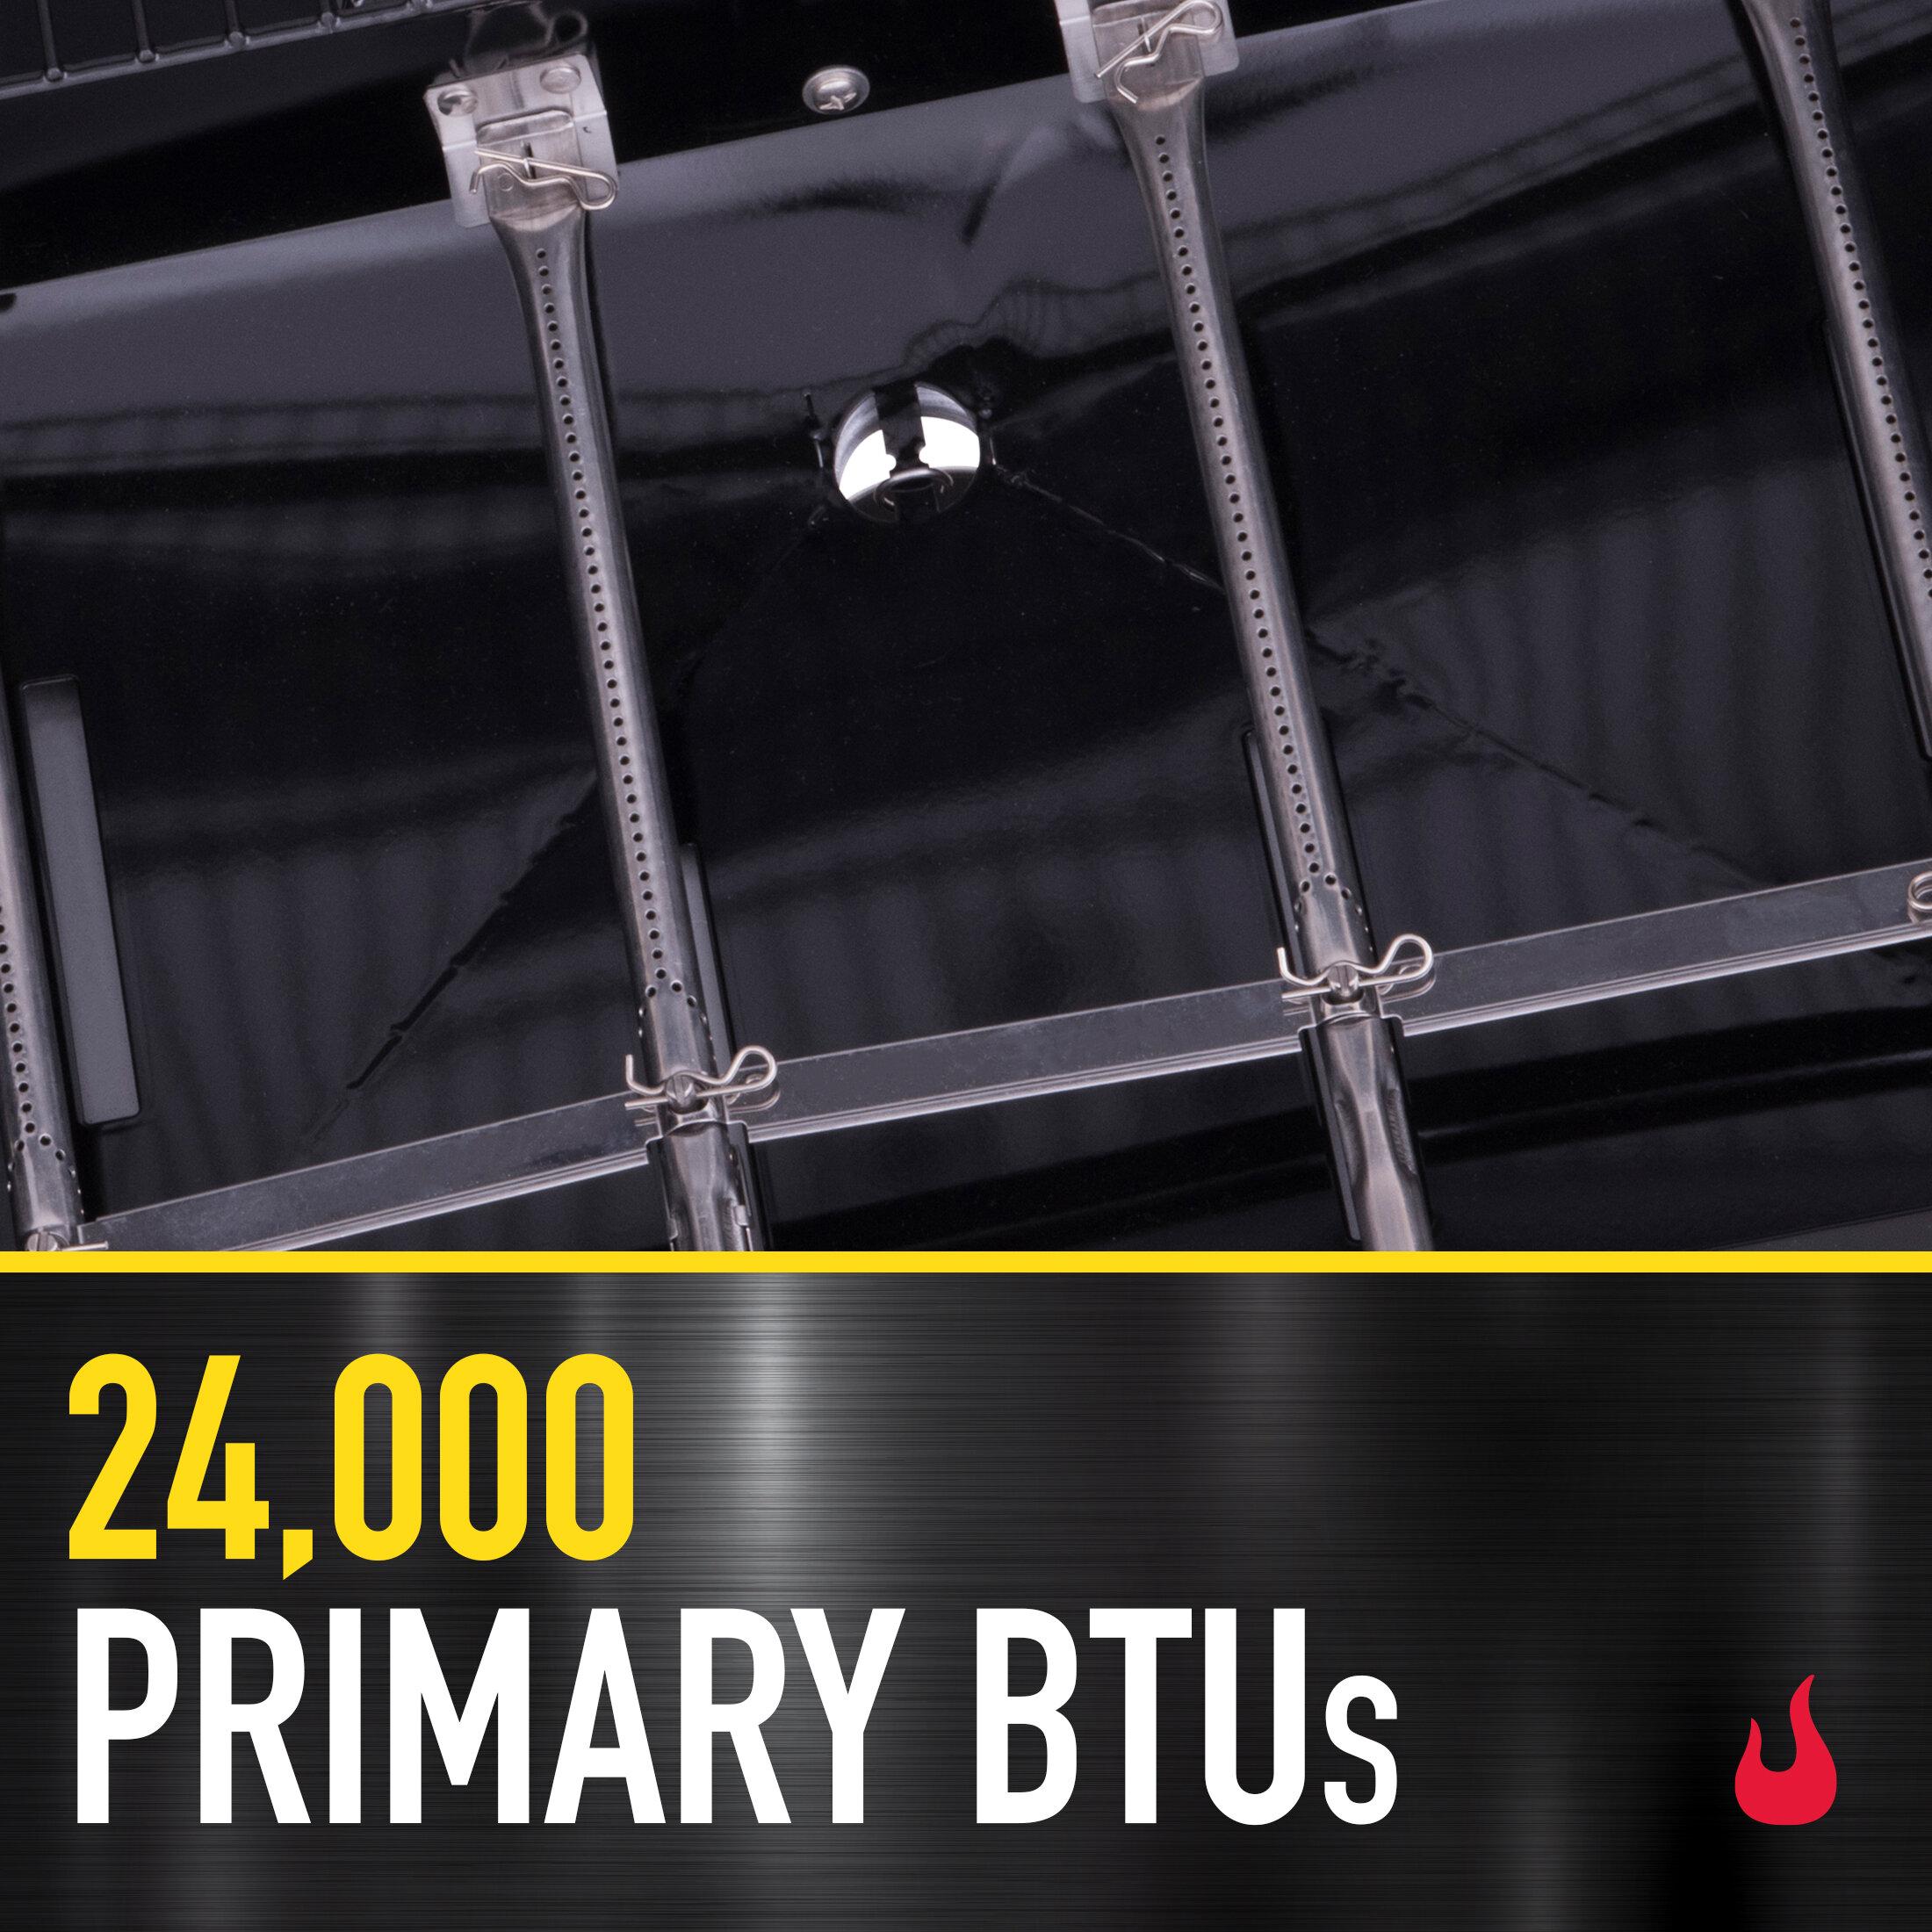 3 Burners with 24,000 BTUs